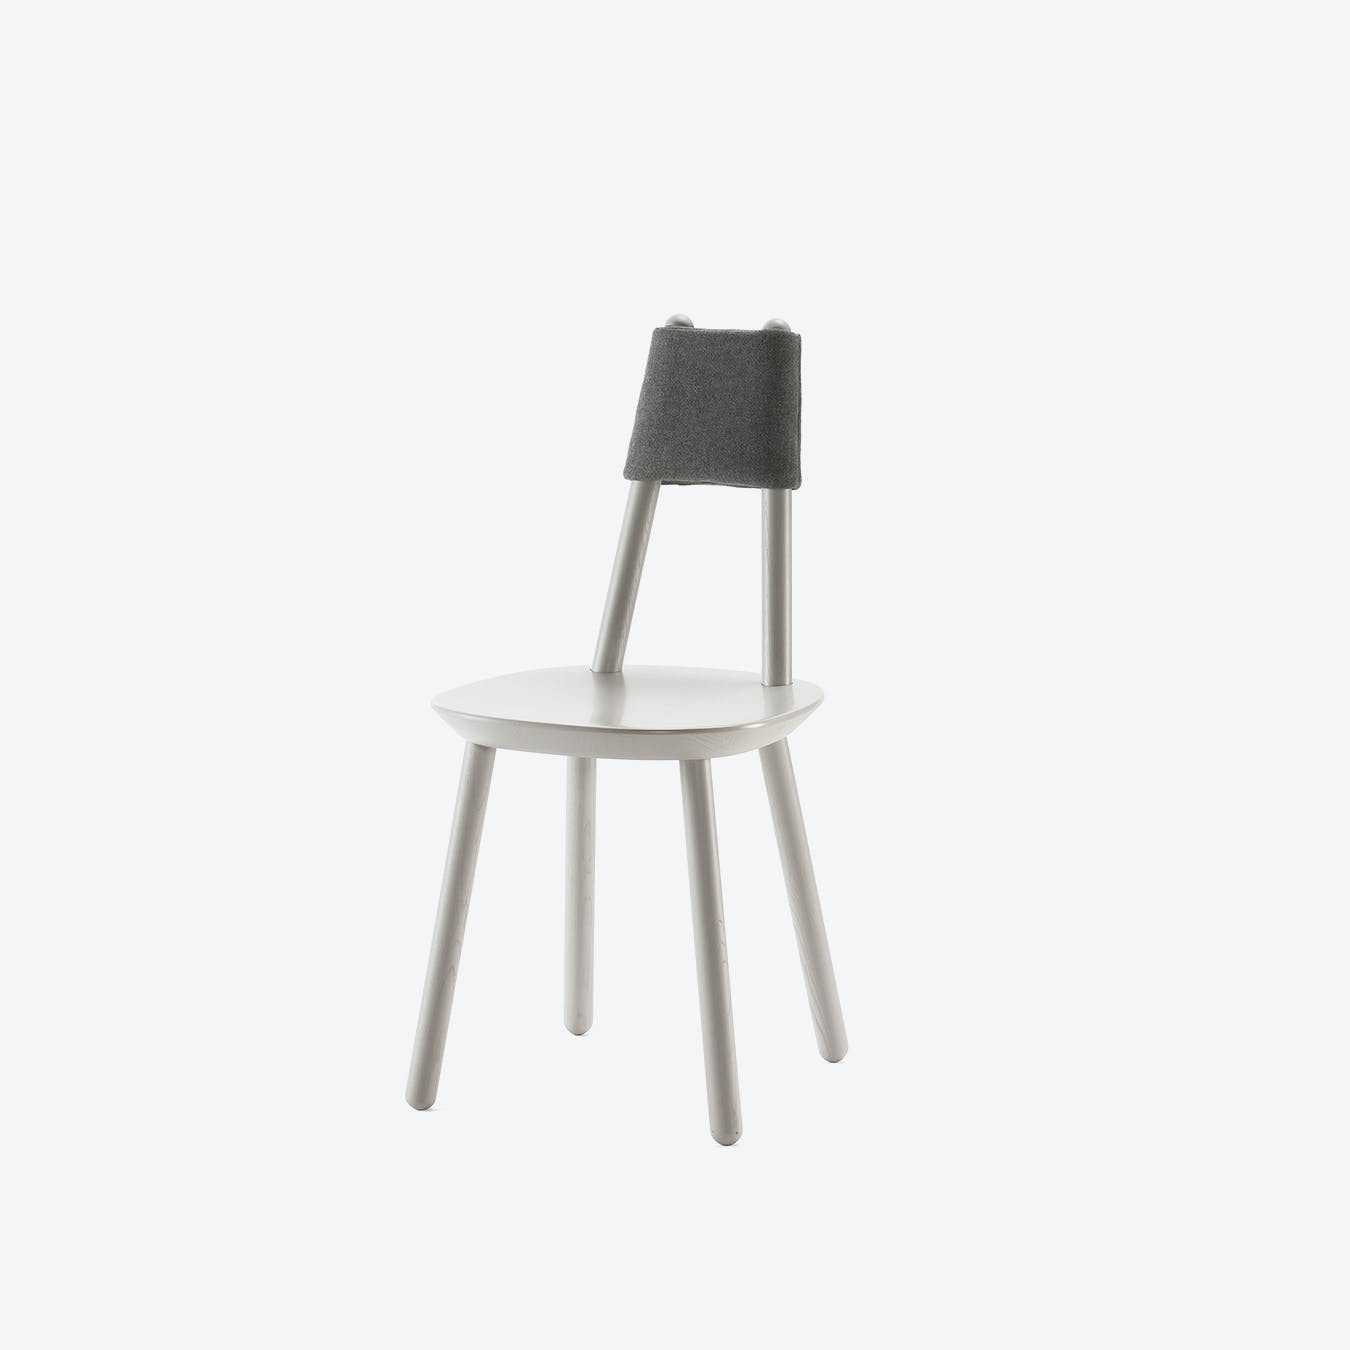 Naïve Chair in Grey